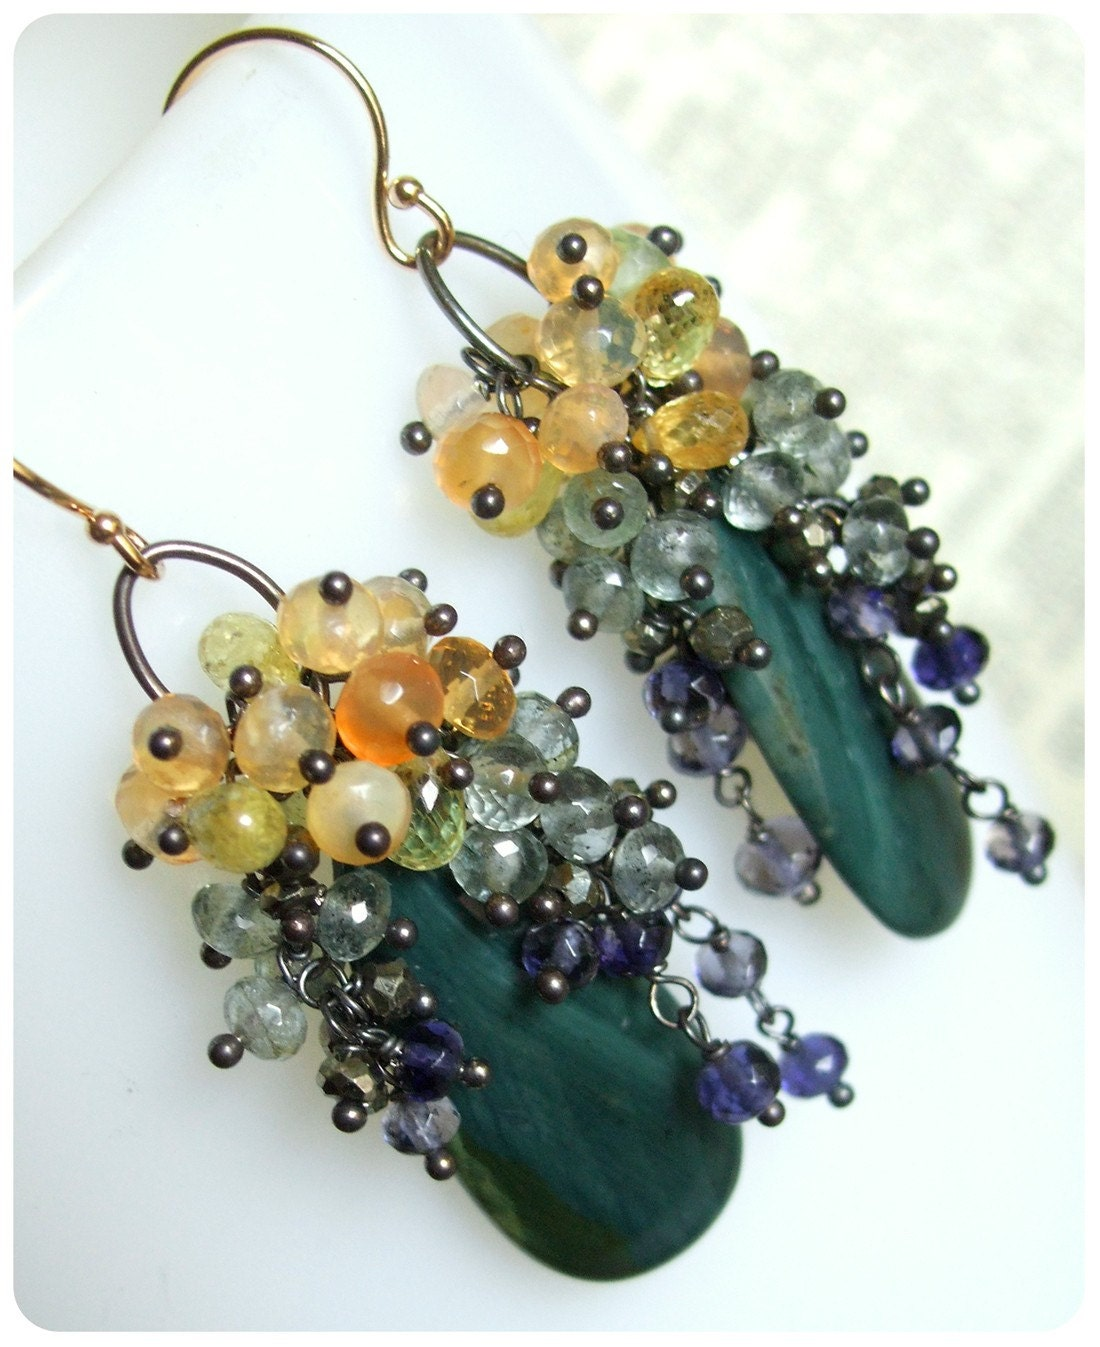 Laburnum earrings - Belle epoque - earrings